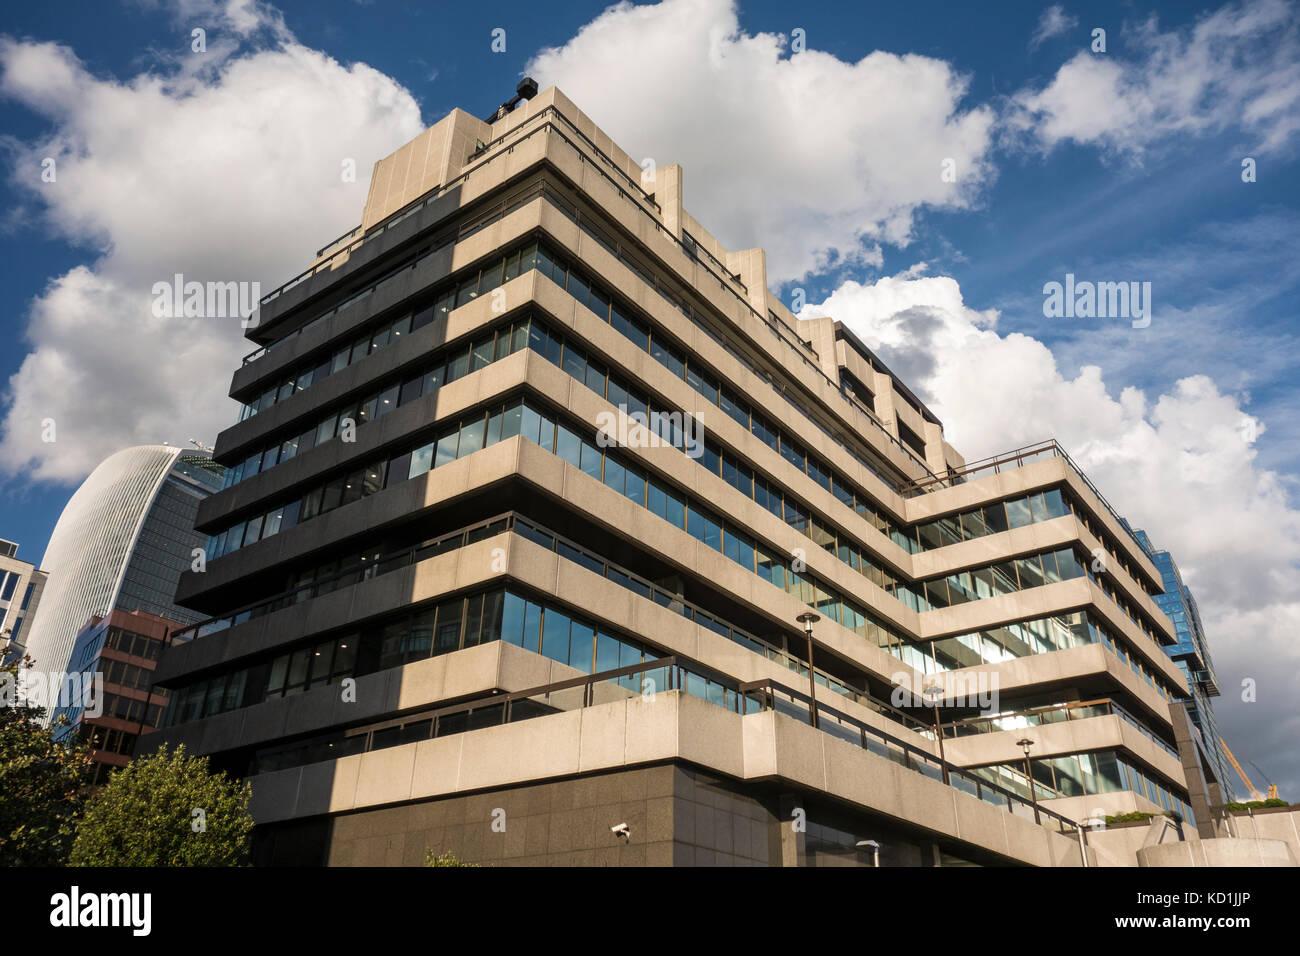 Seventies architecture St Magnus House by Richard Seifert & Partners, Lower Thames Street, London, UK - Stock Image